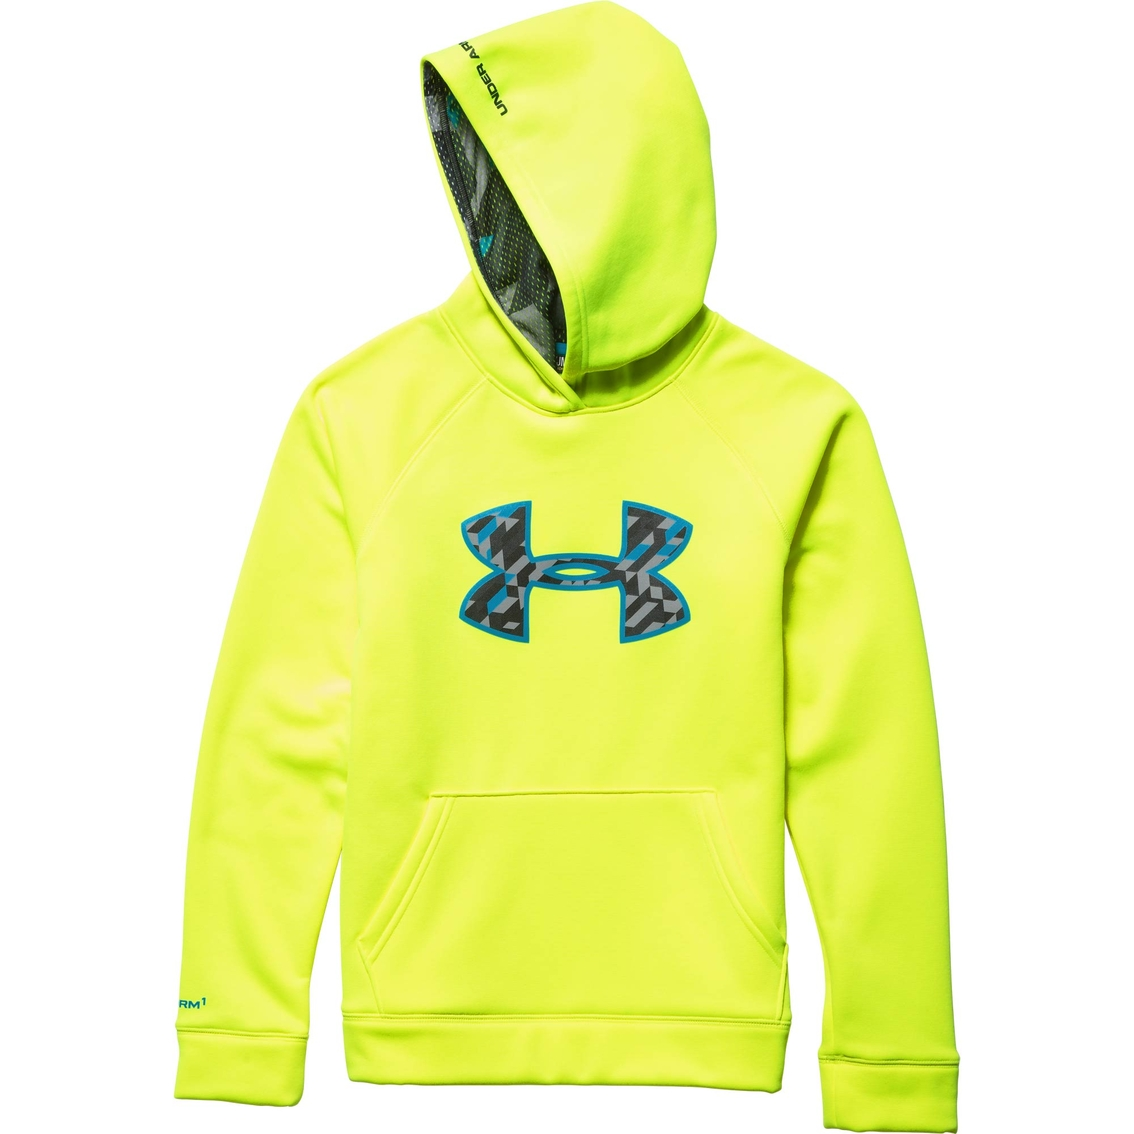 11212bb69 under armour kids sweatshirt cheap > OFF40% The Largest Catalog ...